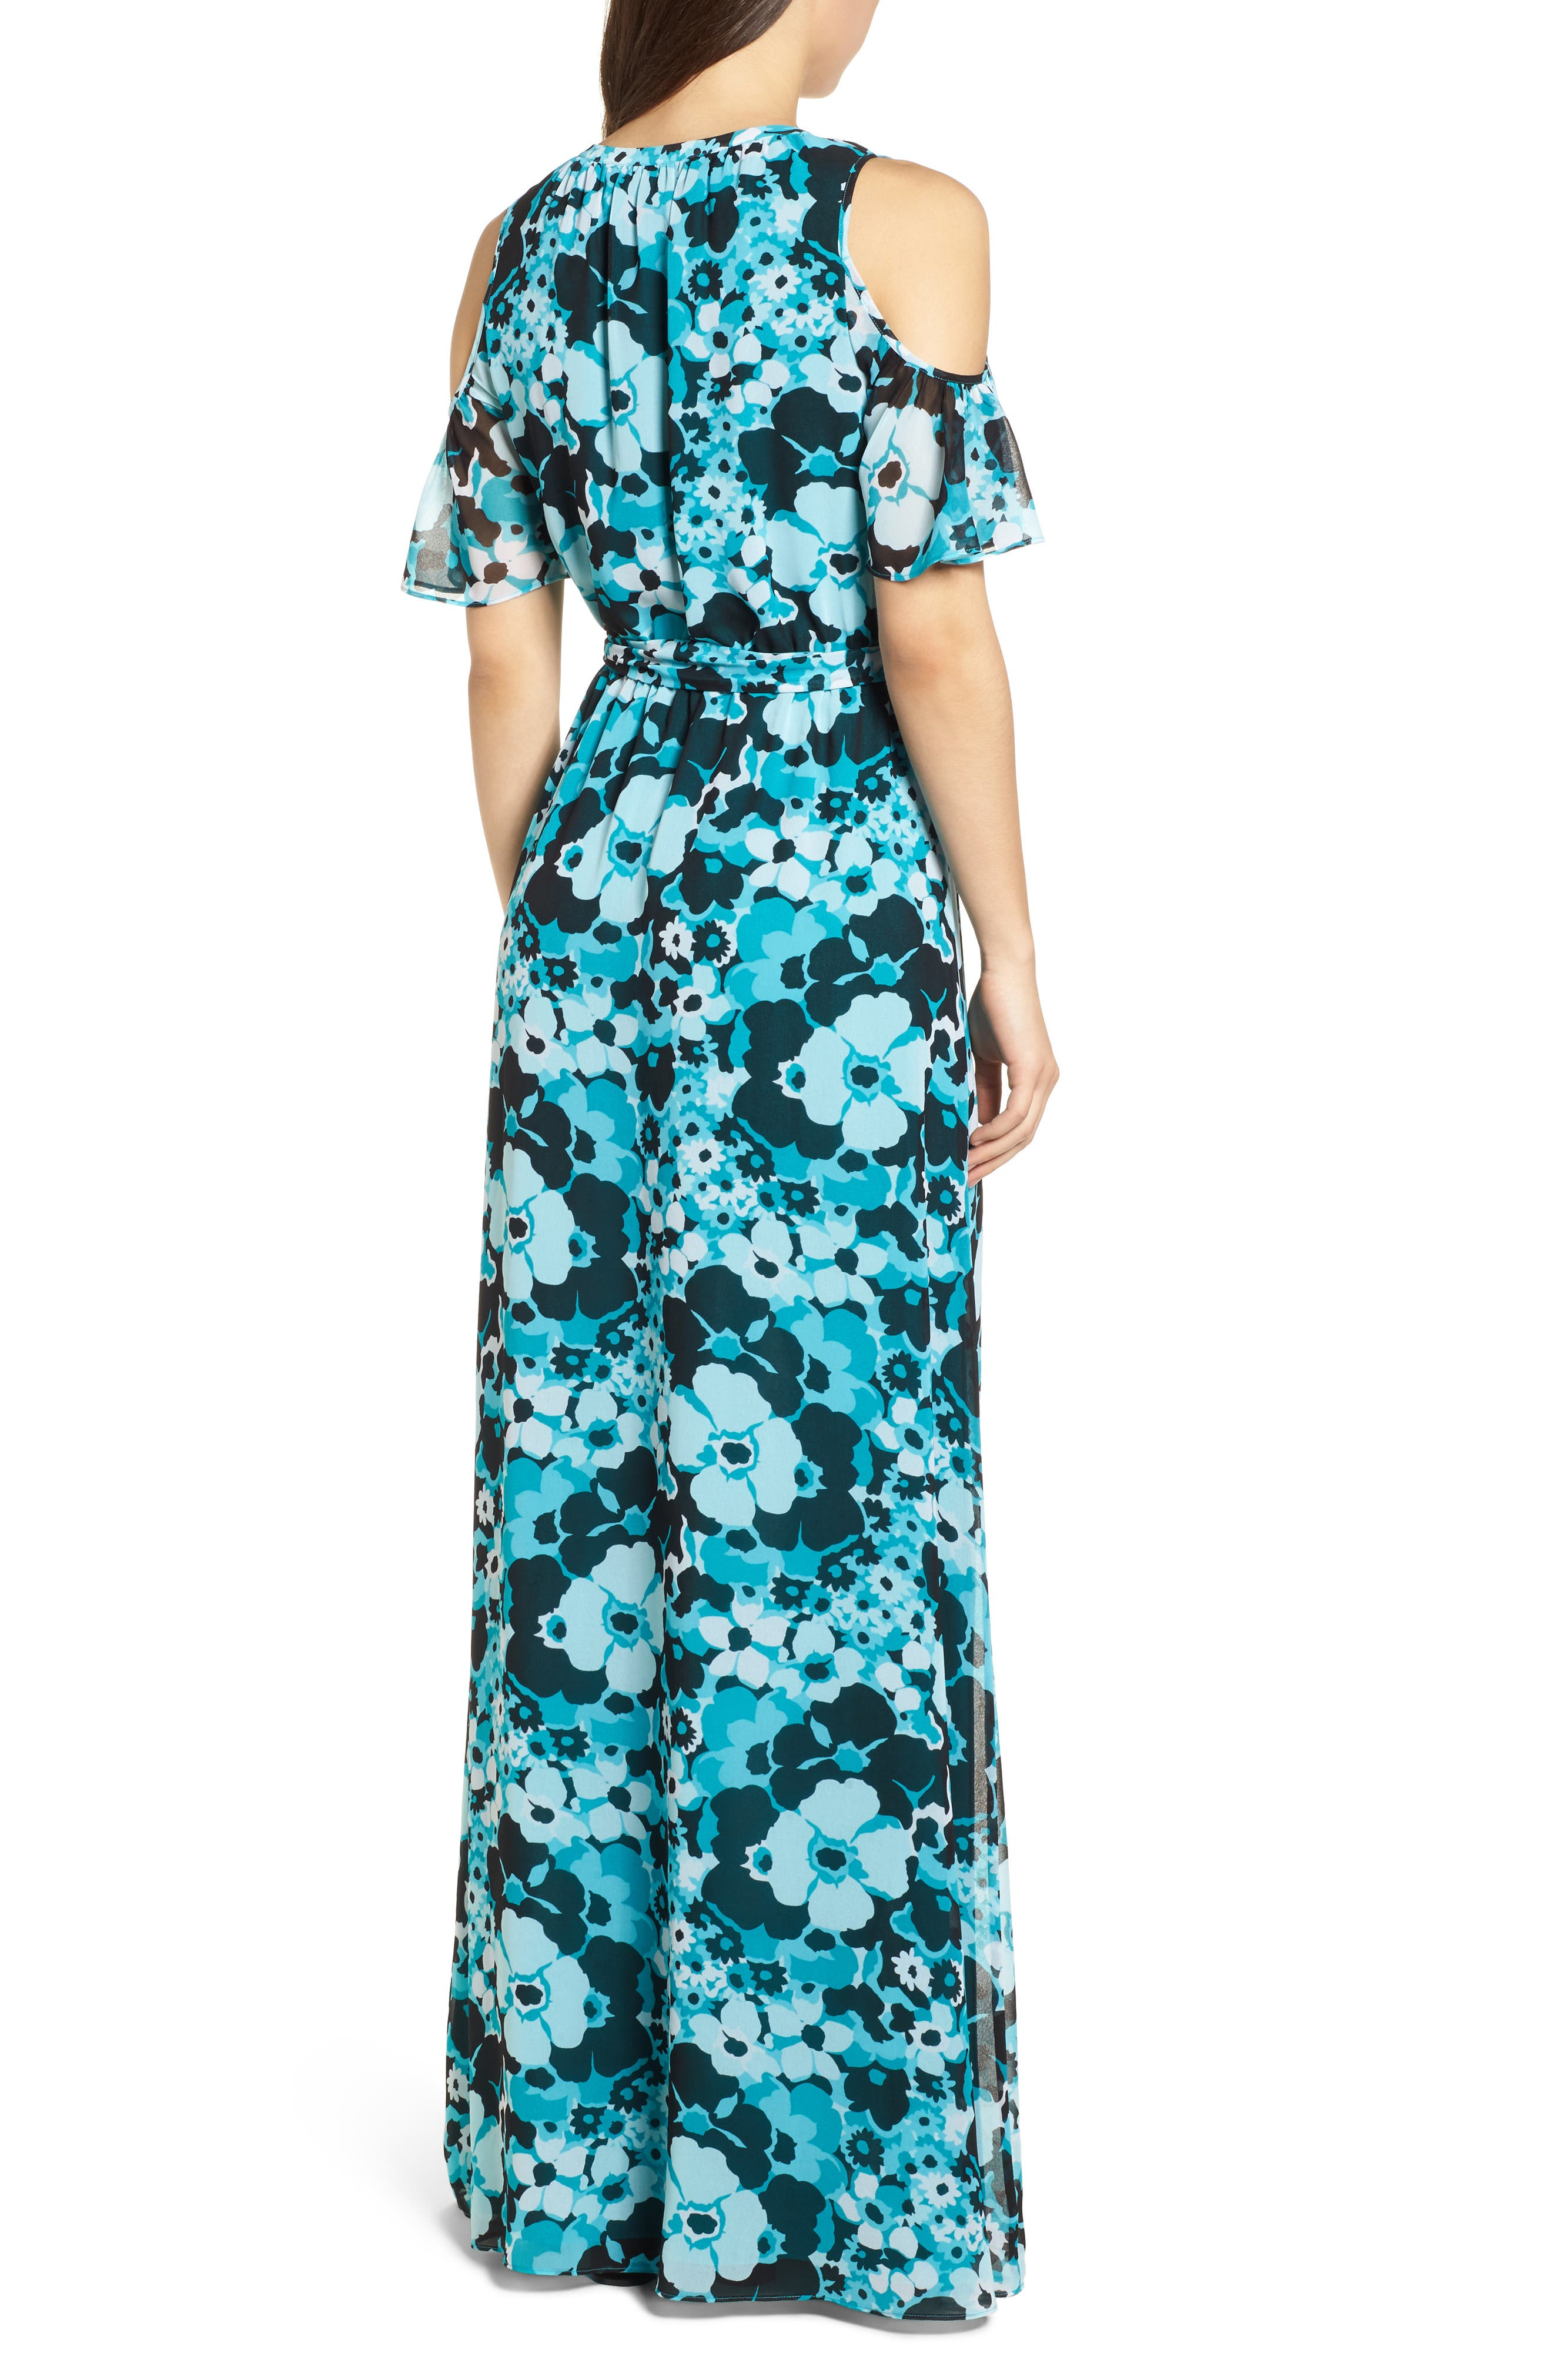 Spring Floral Maxi Dress,                             Alternate thumbnail 2, color,                             Tile Blue/ Black Multi